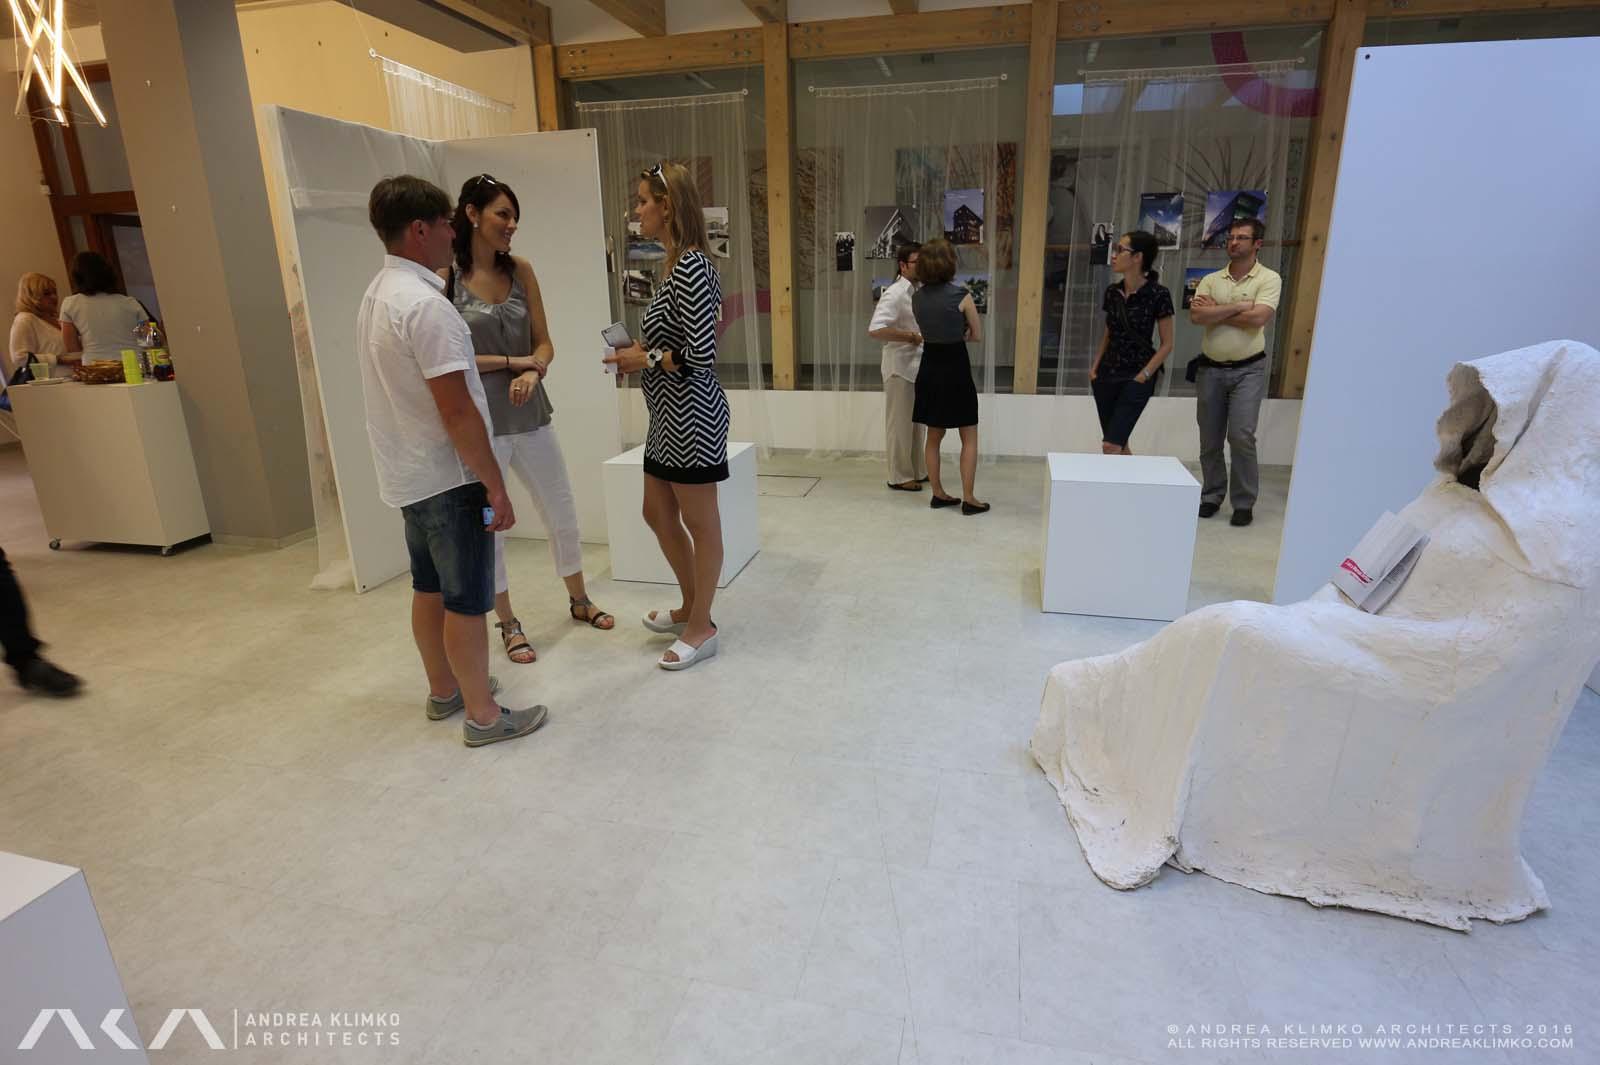 WOMEN ARCHITECTS EXHIBITION